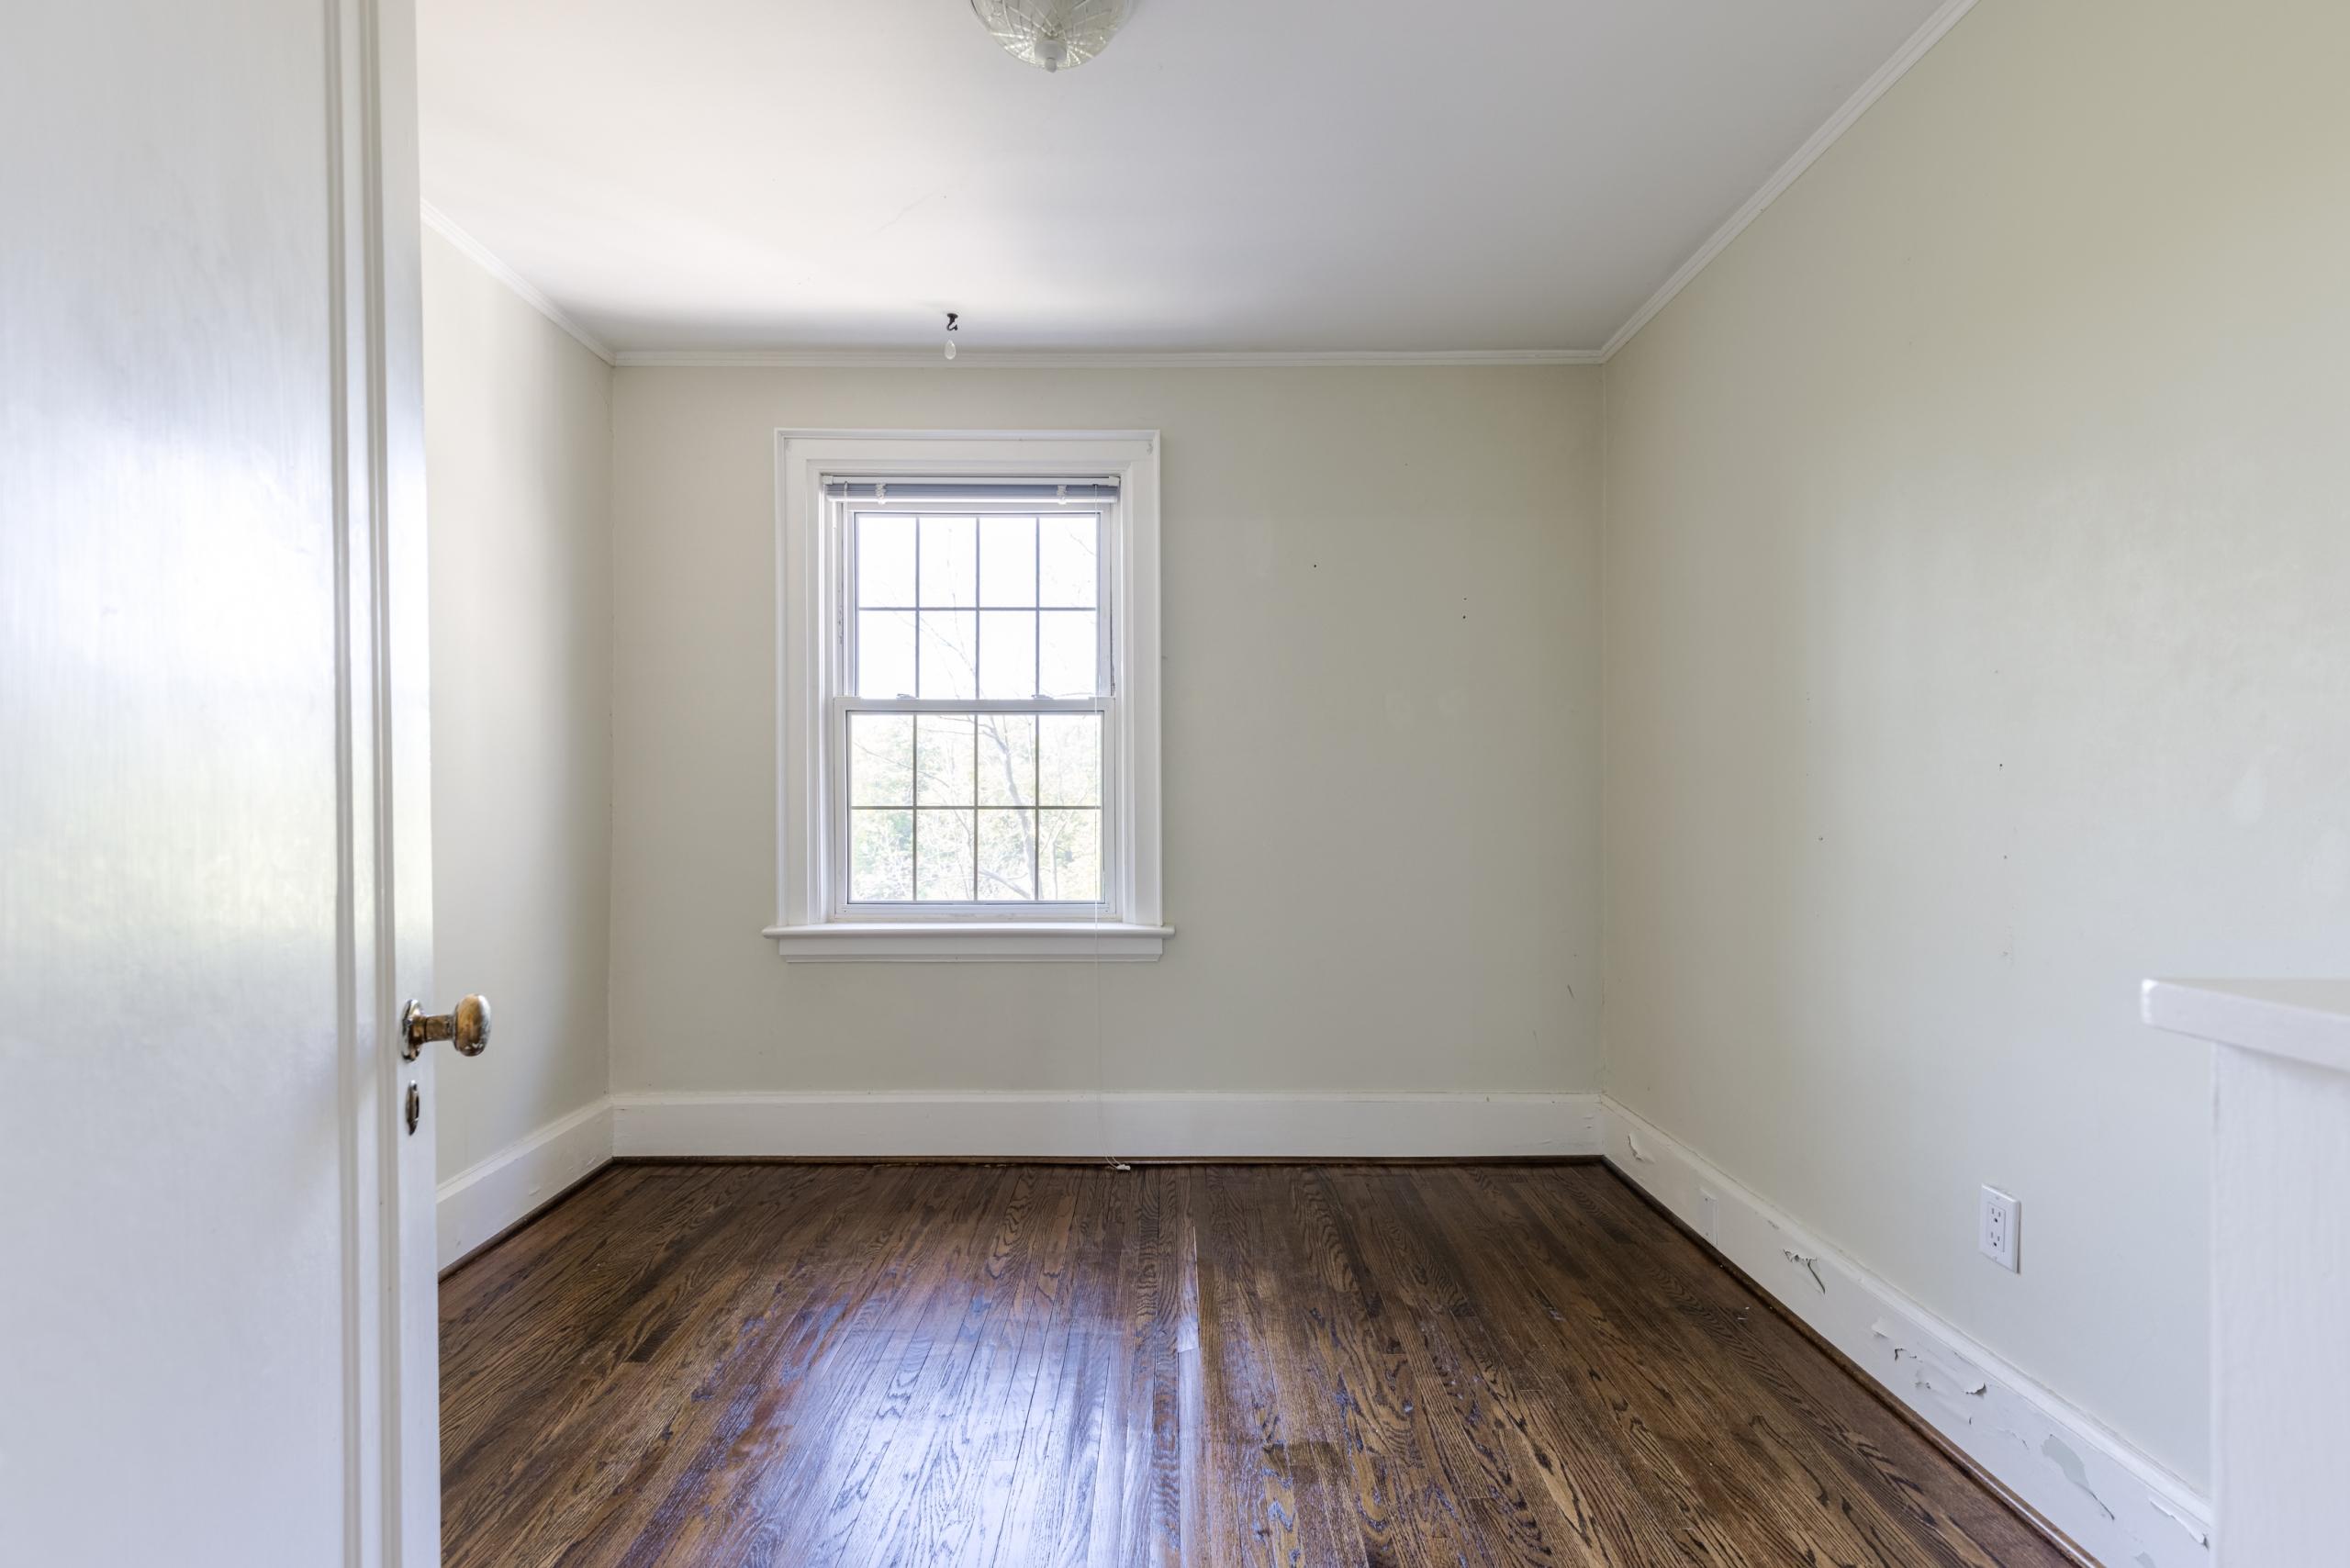 Bedroom featured at 416 Trafalgar Road, Oakville at Alex Irish & Associates